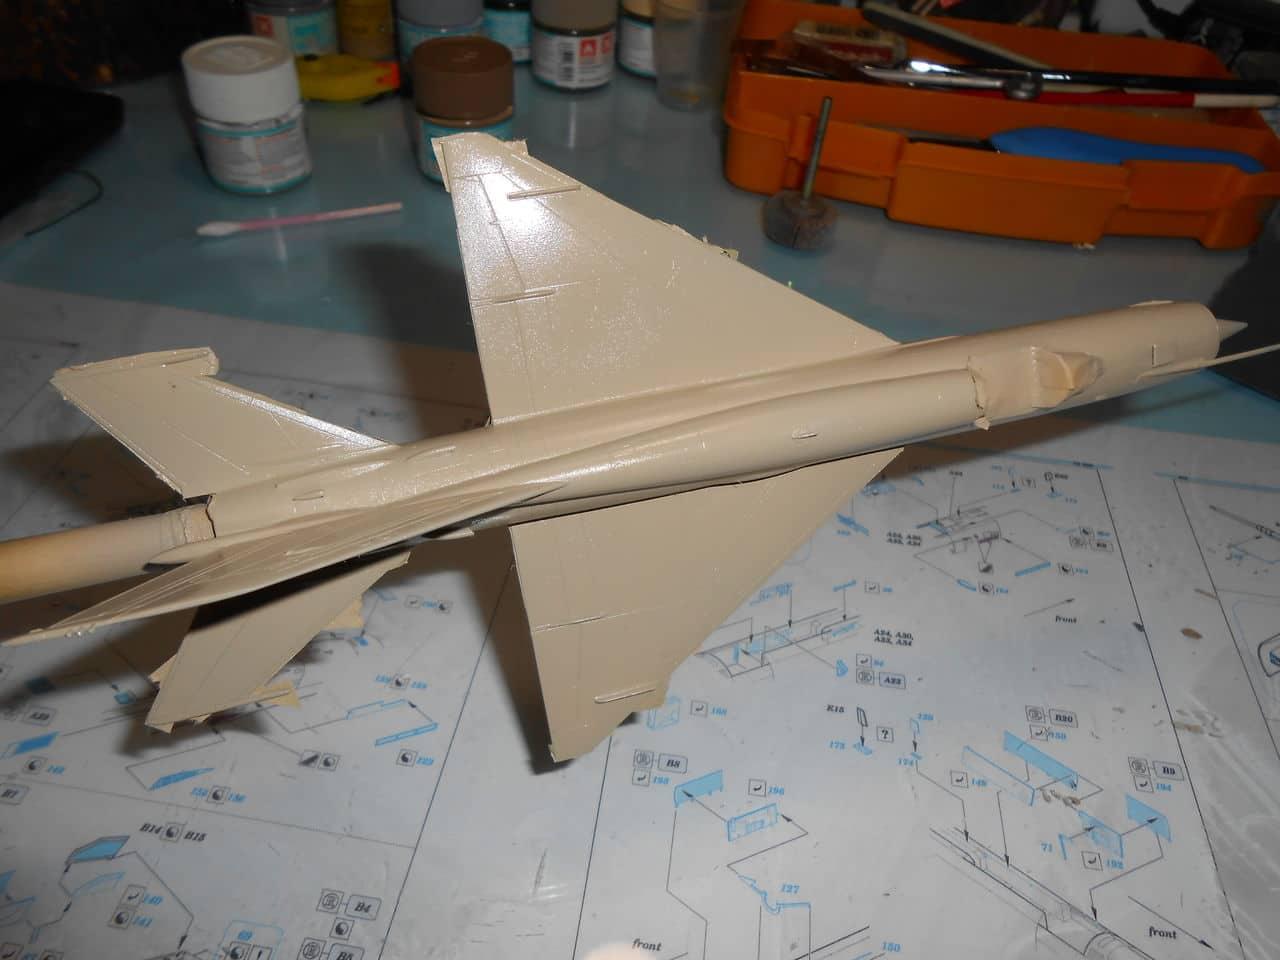 MiG 21 R MAC μεγαλο θεμα  - Σελίδα 2 DSCN1593